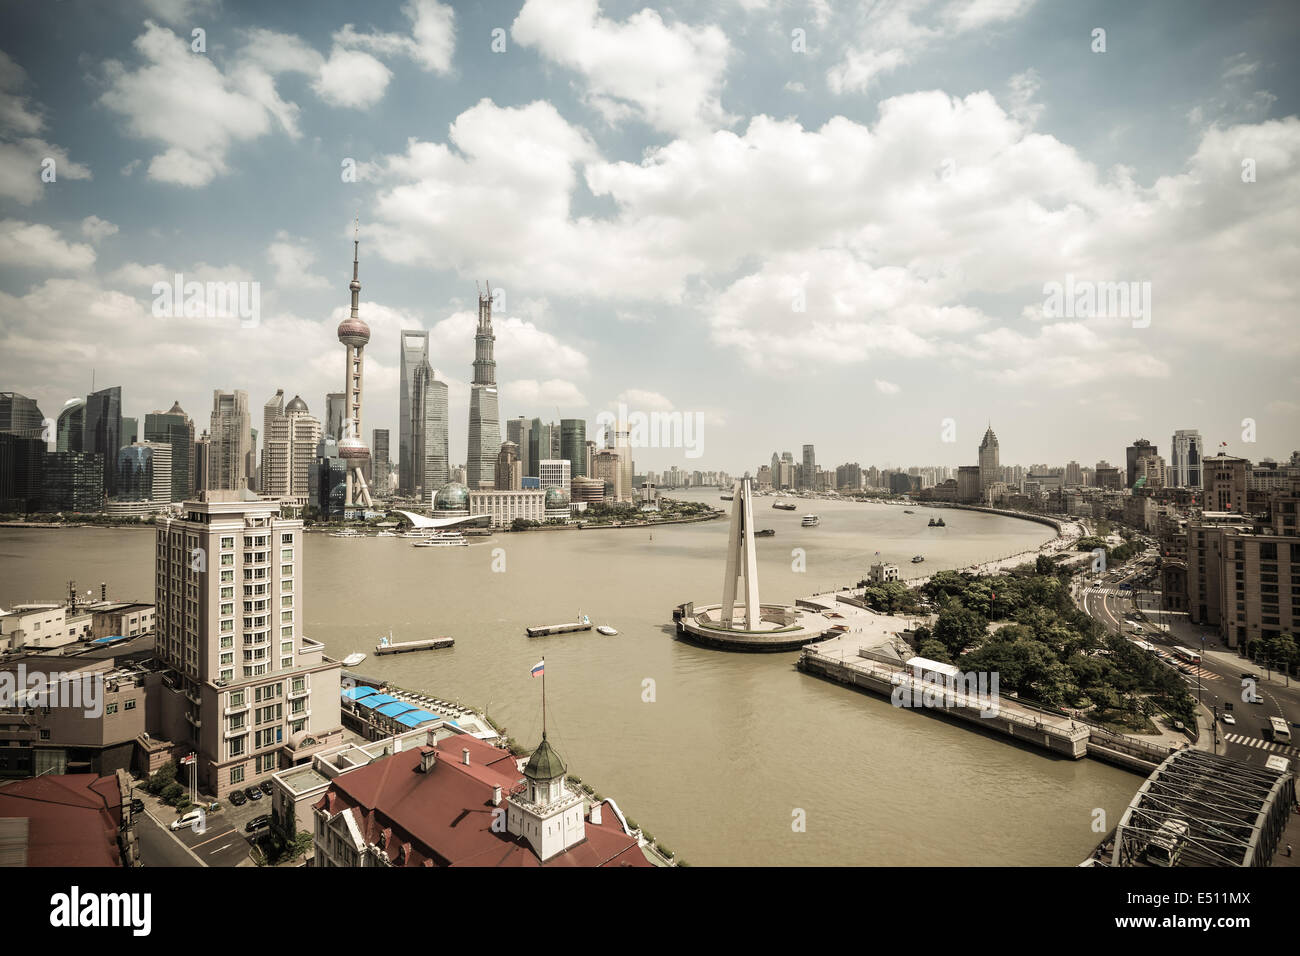 shanghai skyline at daytime - Stock Image